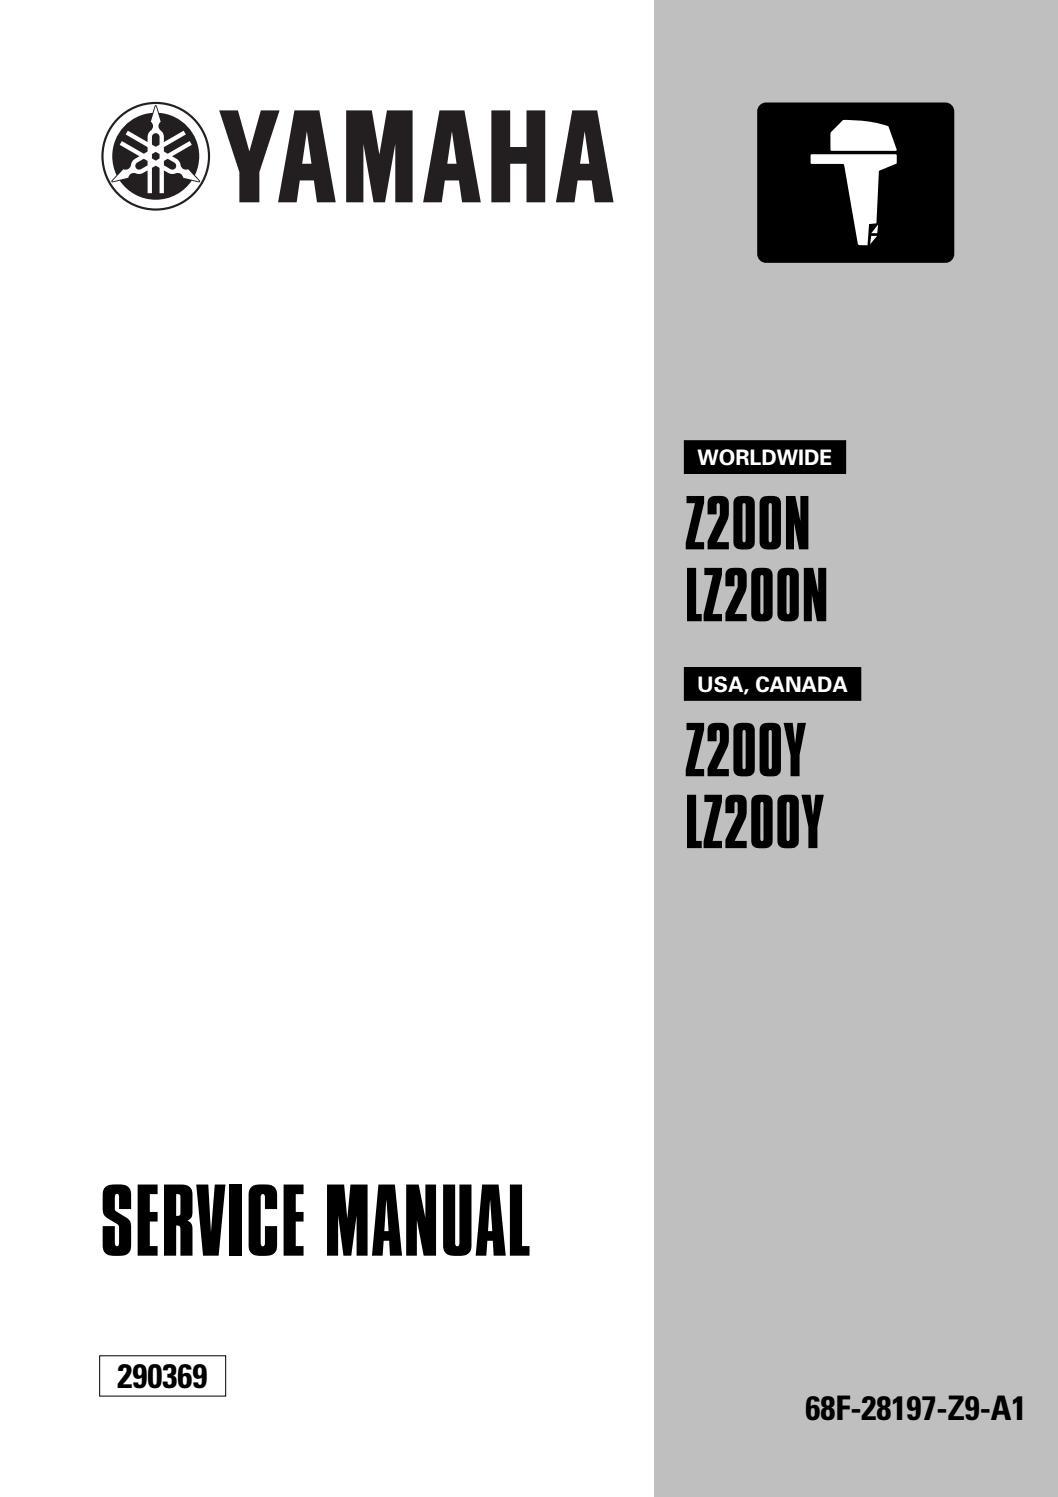 Yamaha outboard z200neto, z200tr service repair manual x